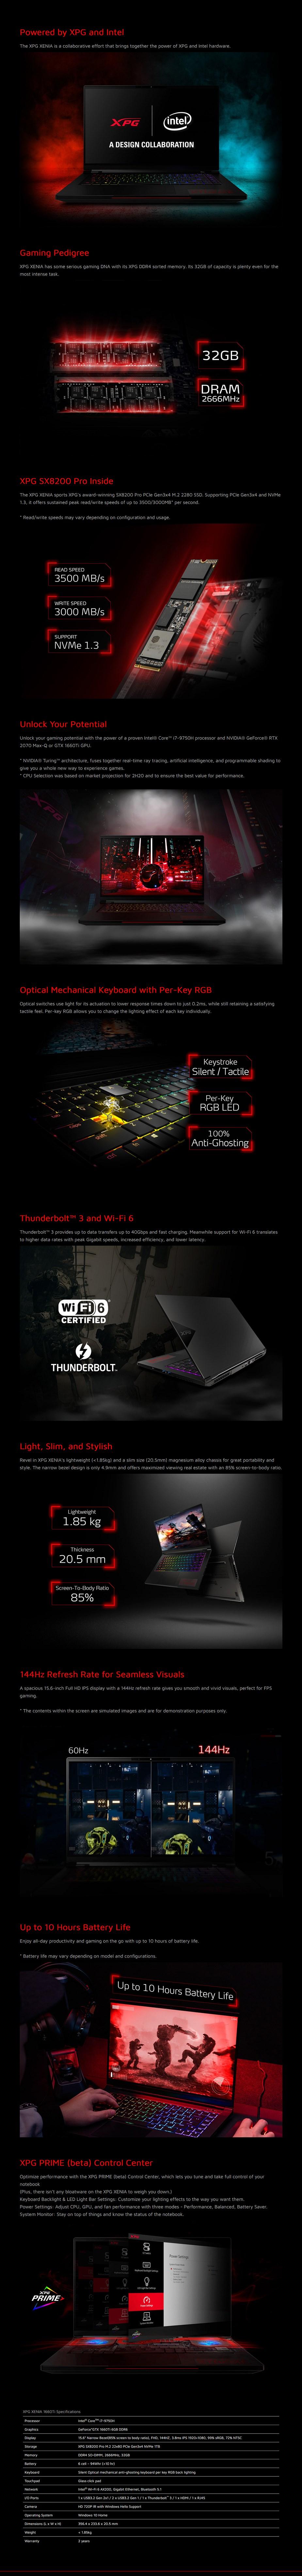 "ADATA XPG NB-XPG-XENIA15 15.6"" 144Hz Gaming Laptop i7-9750H 32GB 1TB 1660Ti W10H - Desktop Overview 1"